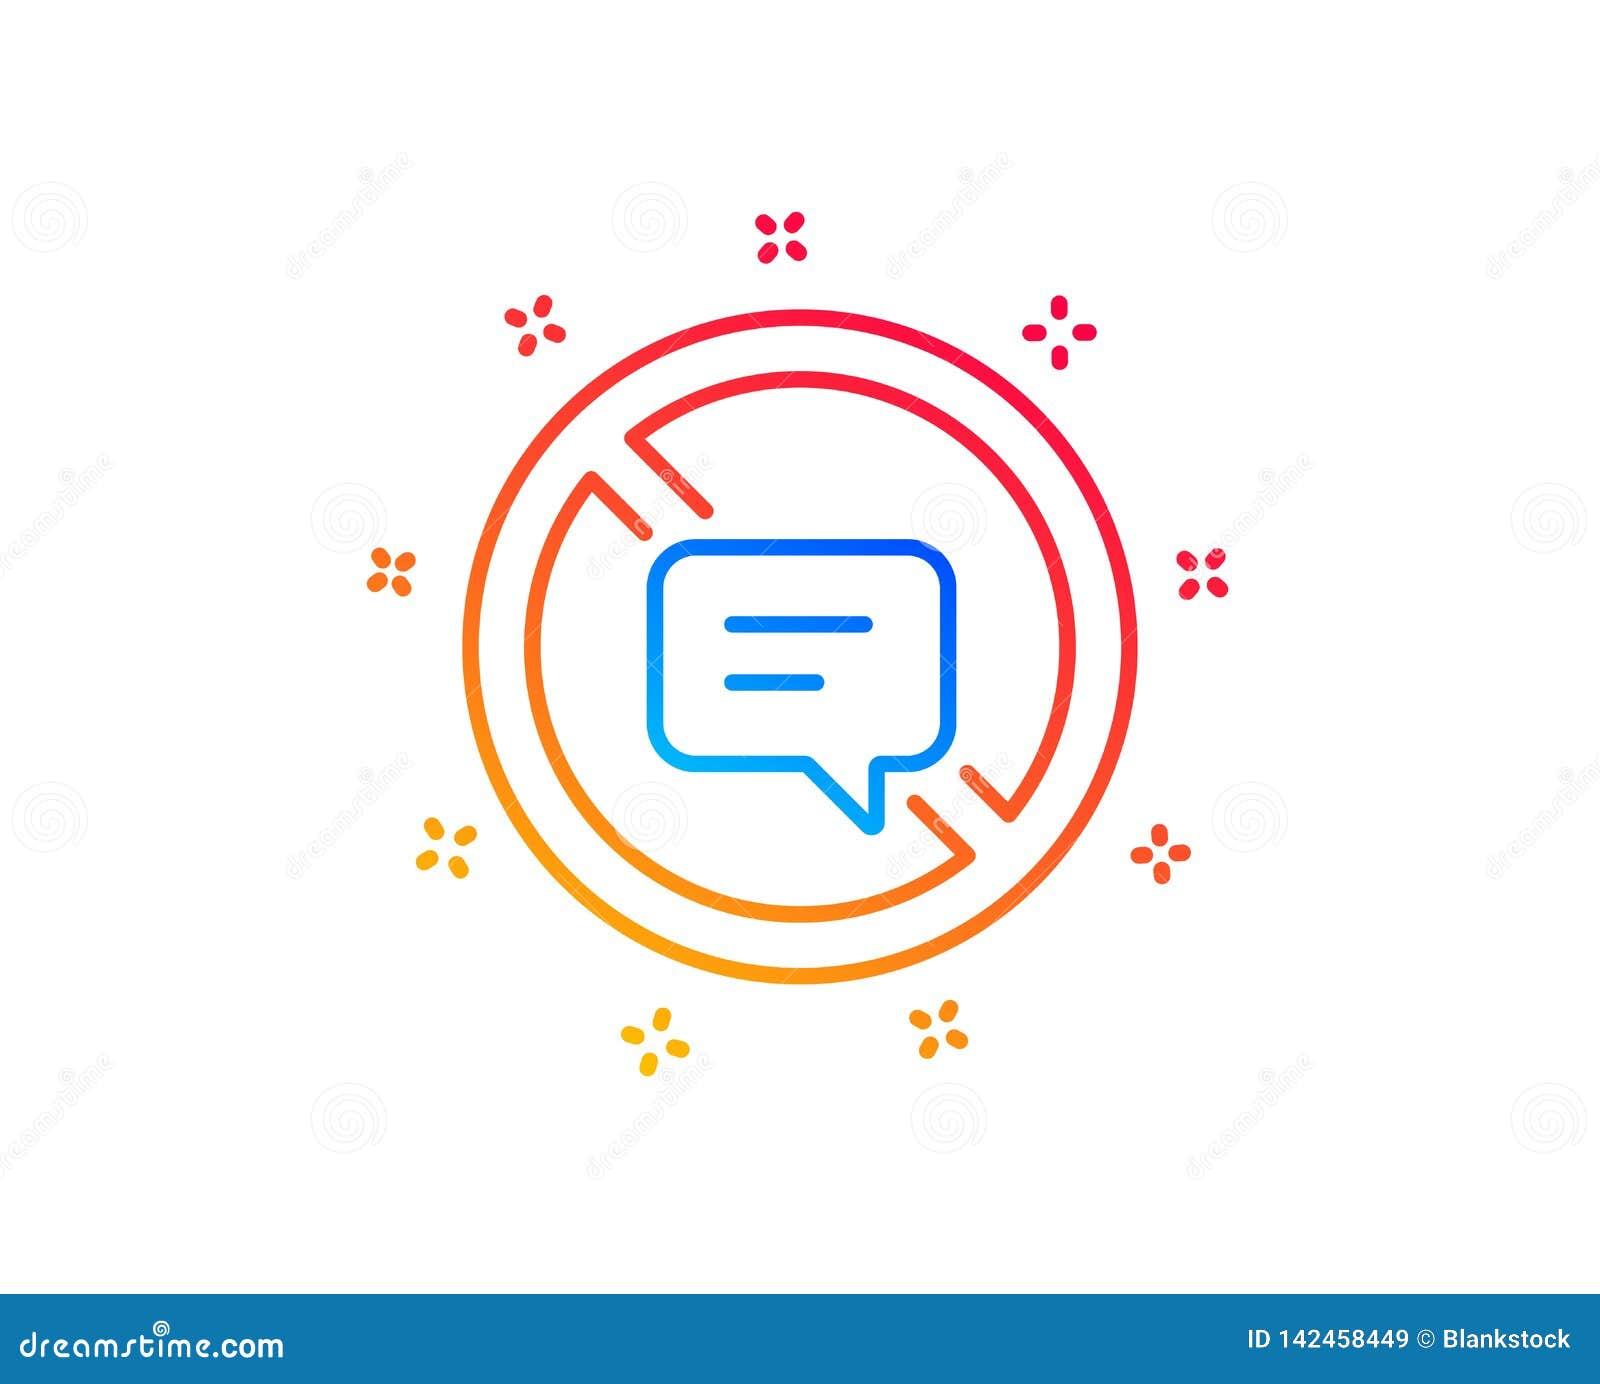 Chat service text random Best sexting